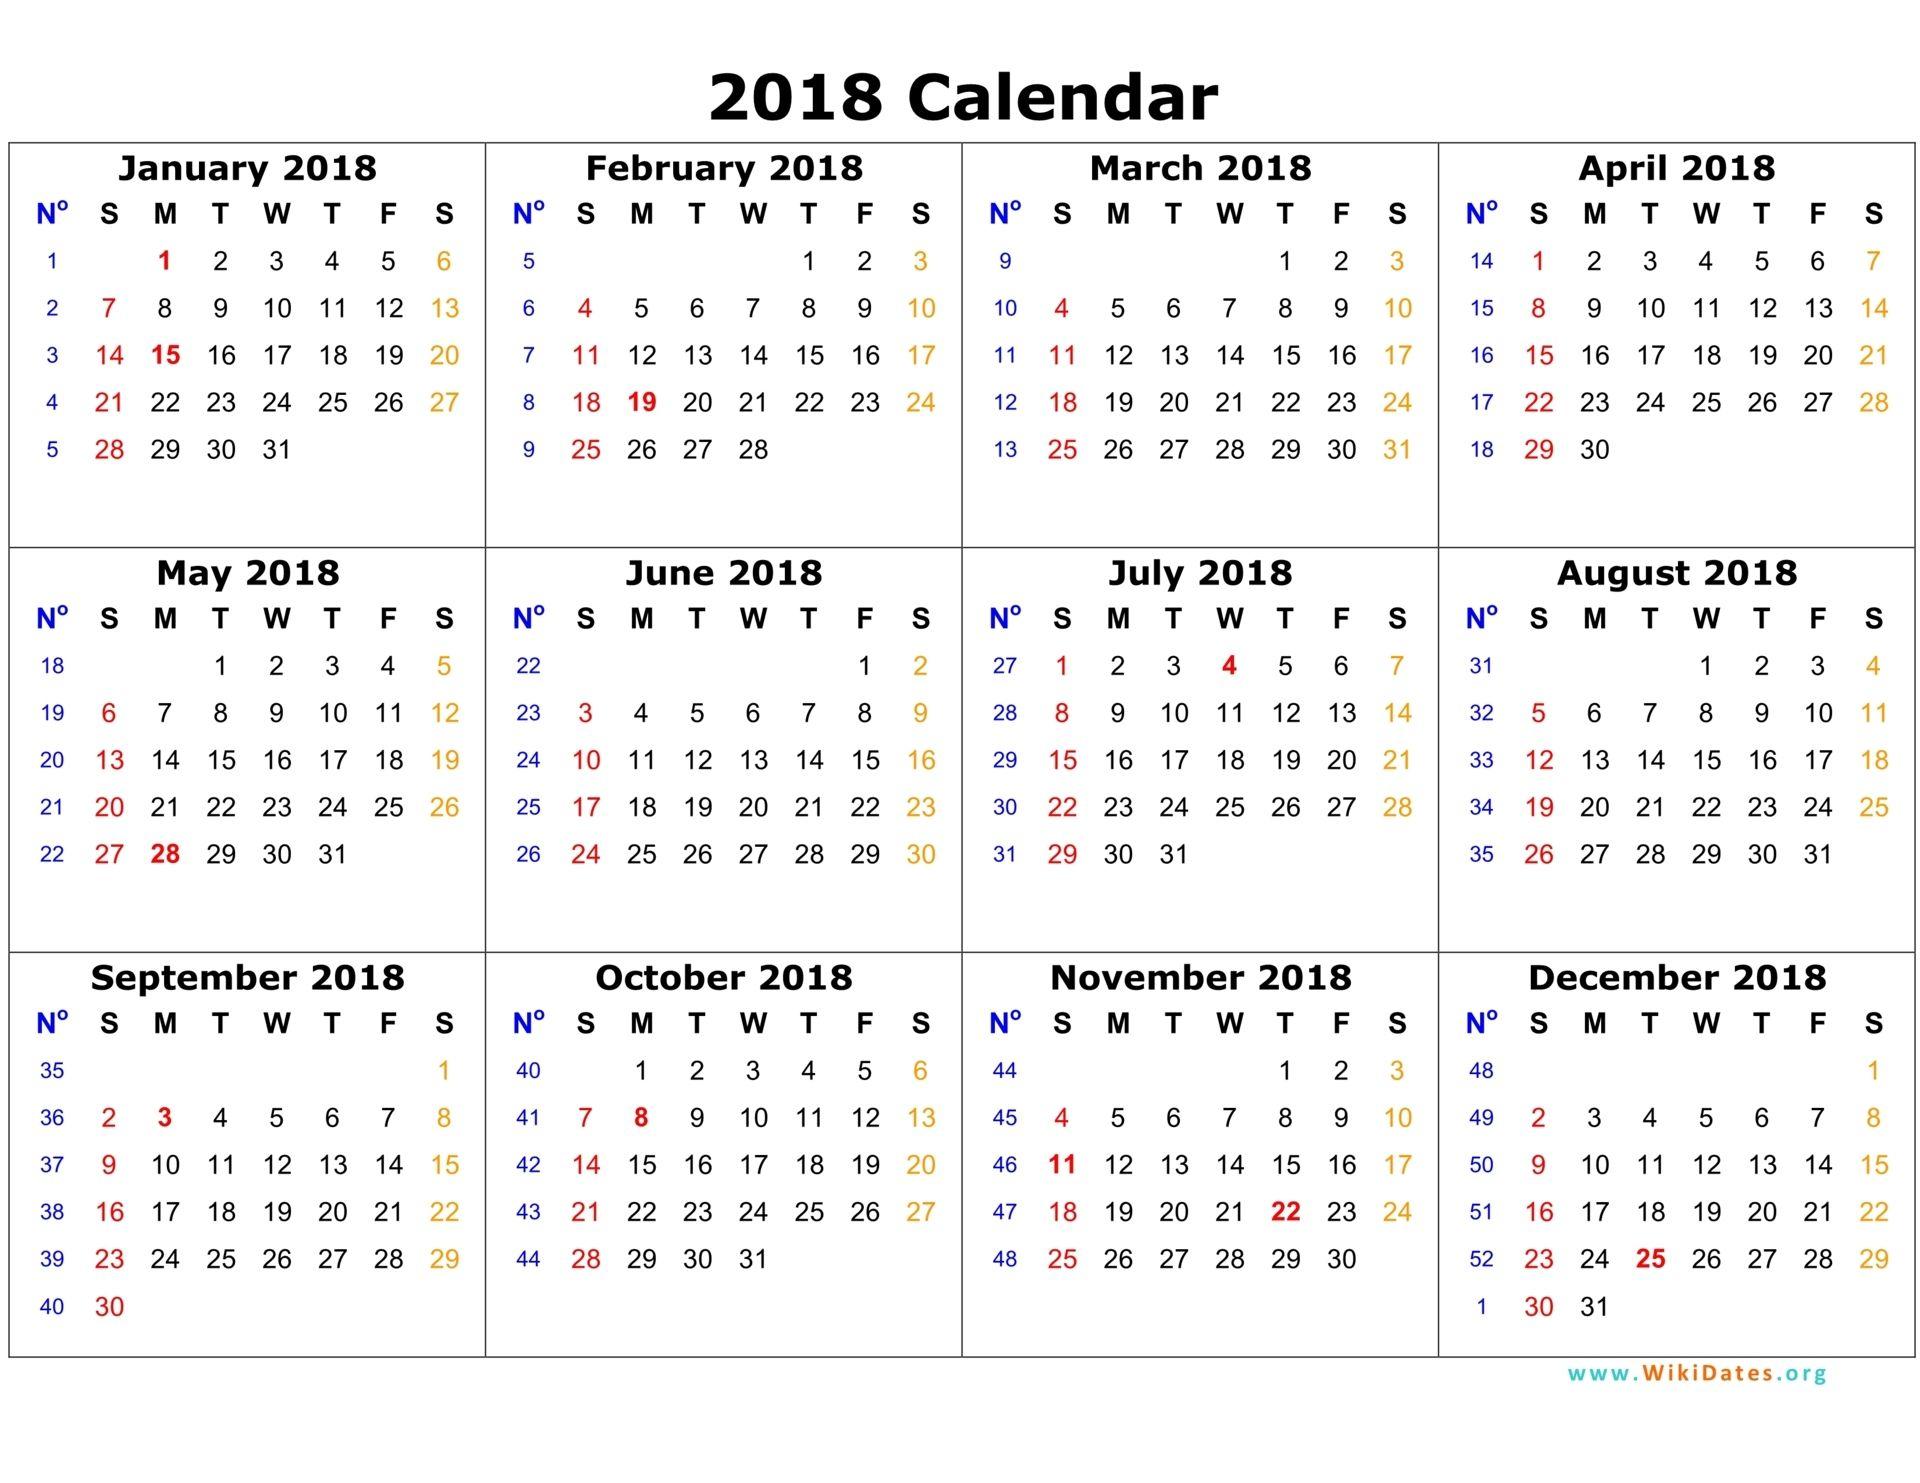 2018 Calendar On One Page | Calendar Template 2016 | Planner Stuff throughout 12 Month Calendar Template Printable